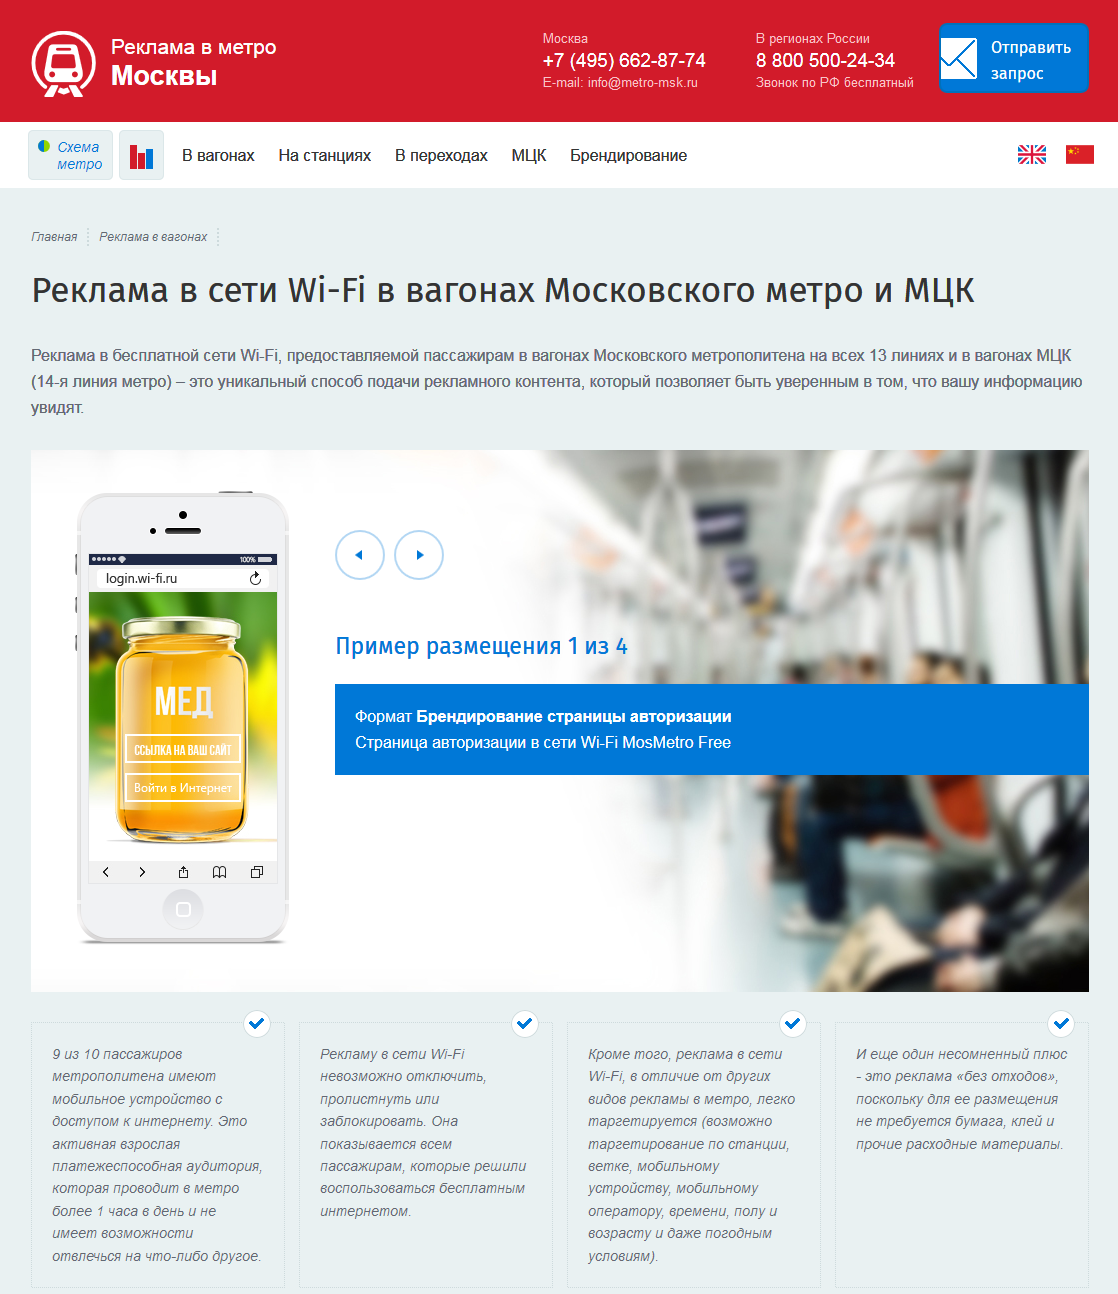 Реклама в сети Wi-Fi в вагонах Москов_ - http___www.metro-msk.ru_reklama-v-~x1